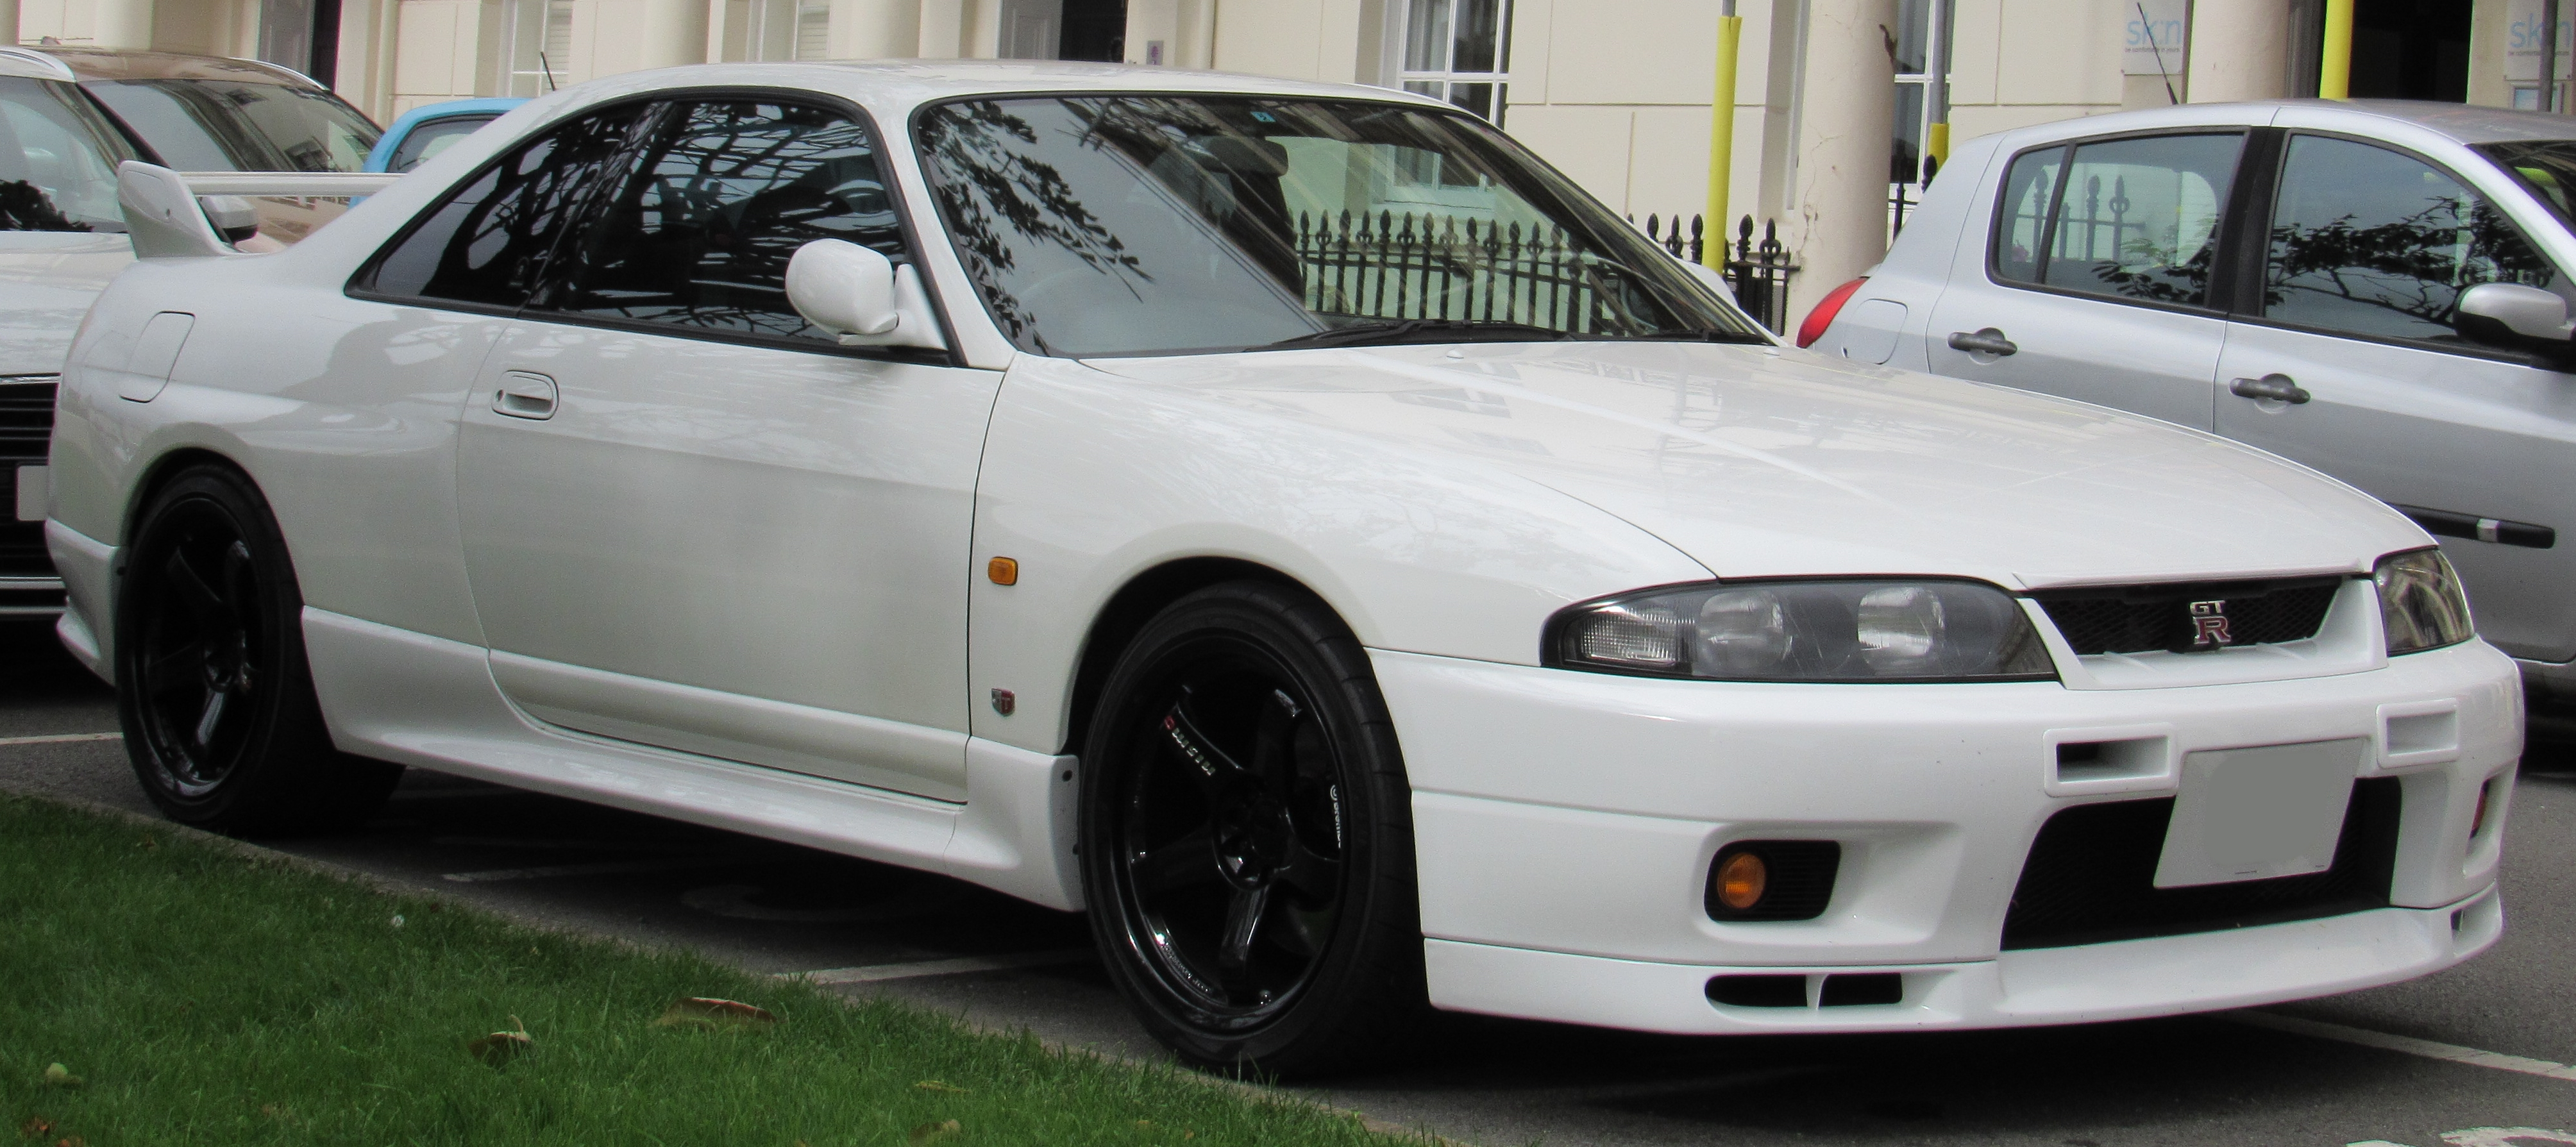 File:1997 Nissan Skyline GTR R33 2 6 jpg - Wikimedia Commons